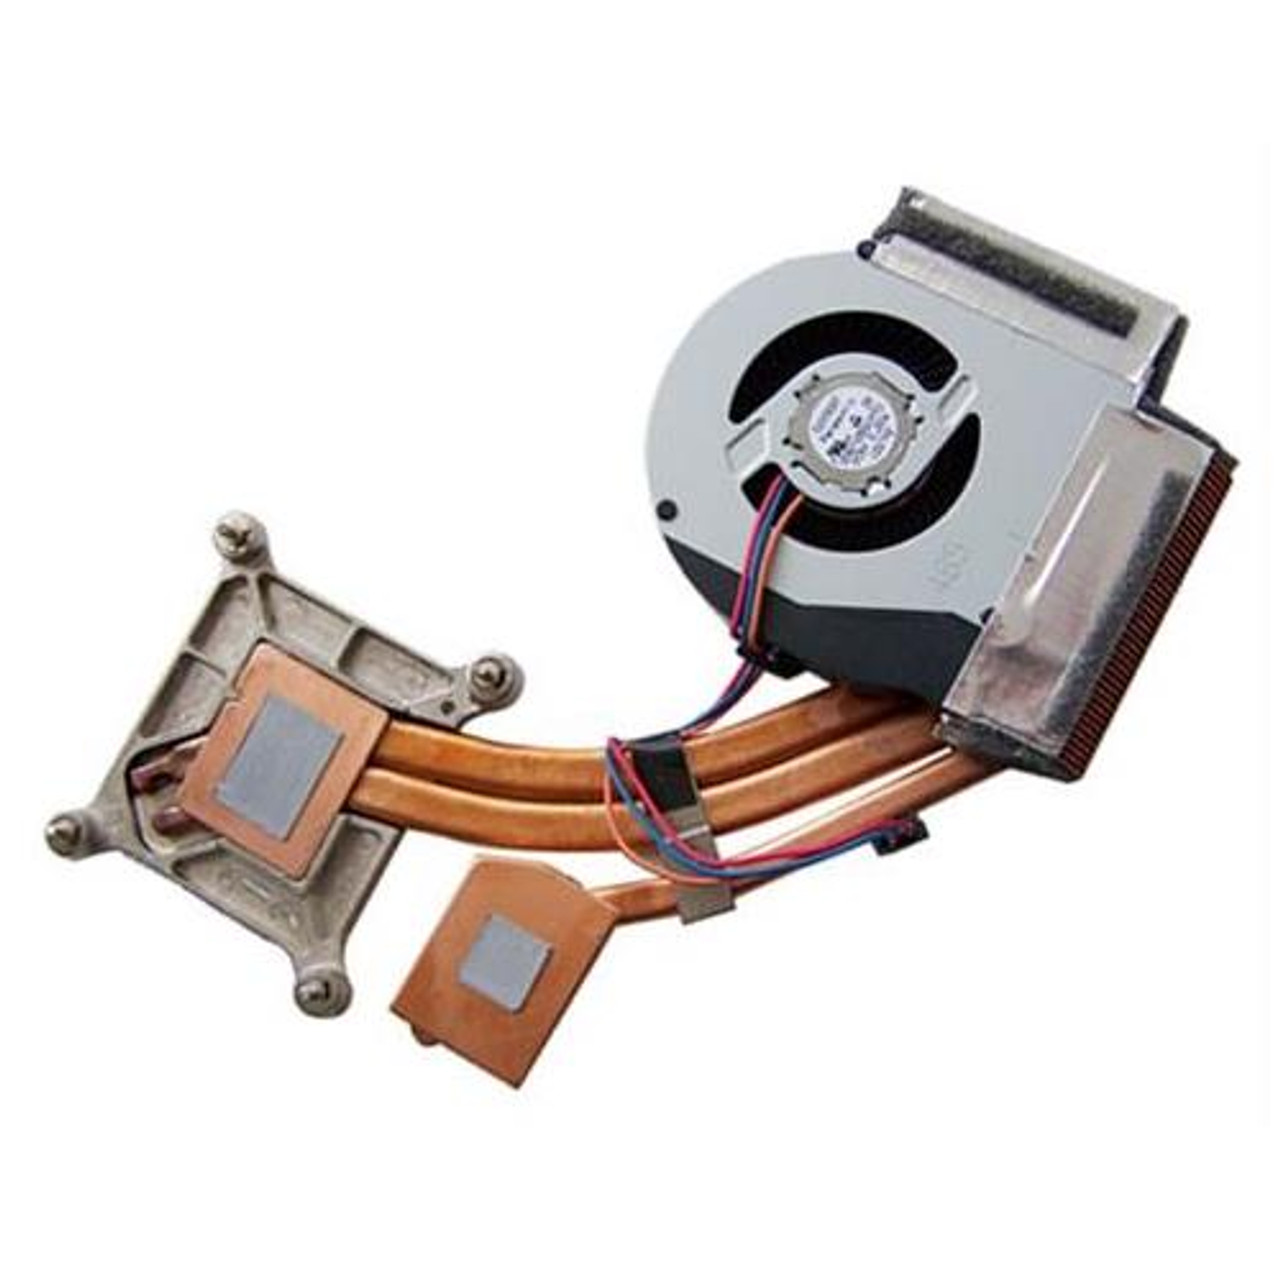 0C45703 Lenovo Cooling Heatsink and Fan for ThinkPad X240